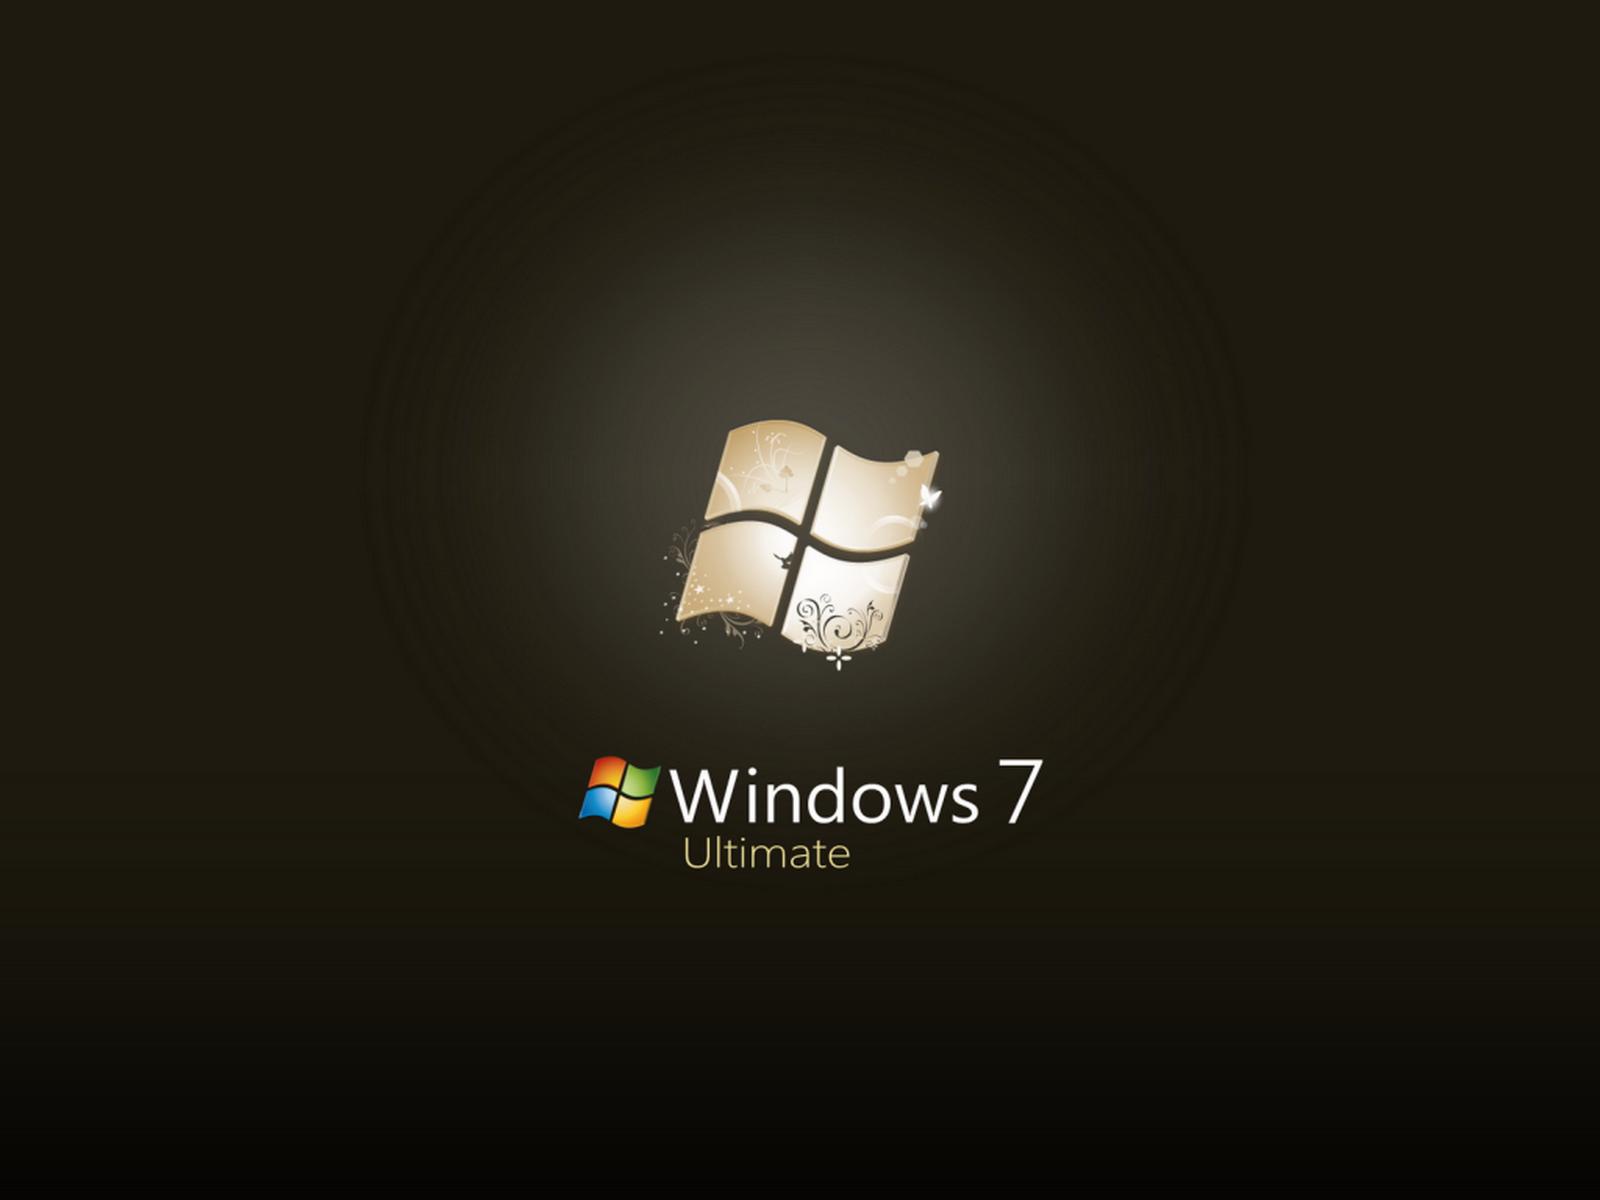 http://1.bp.blogspot.com/_Ys-S-_0xn8g/TAwa6IUSSII/AAAAAAAAPcY/XXgoWMwWjAI/s1600/Windows+7+Ultimate+1920x1440.png